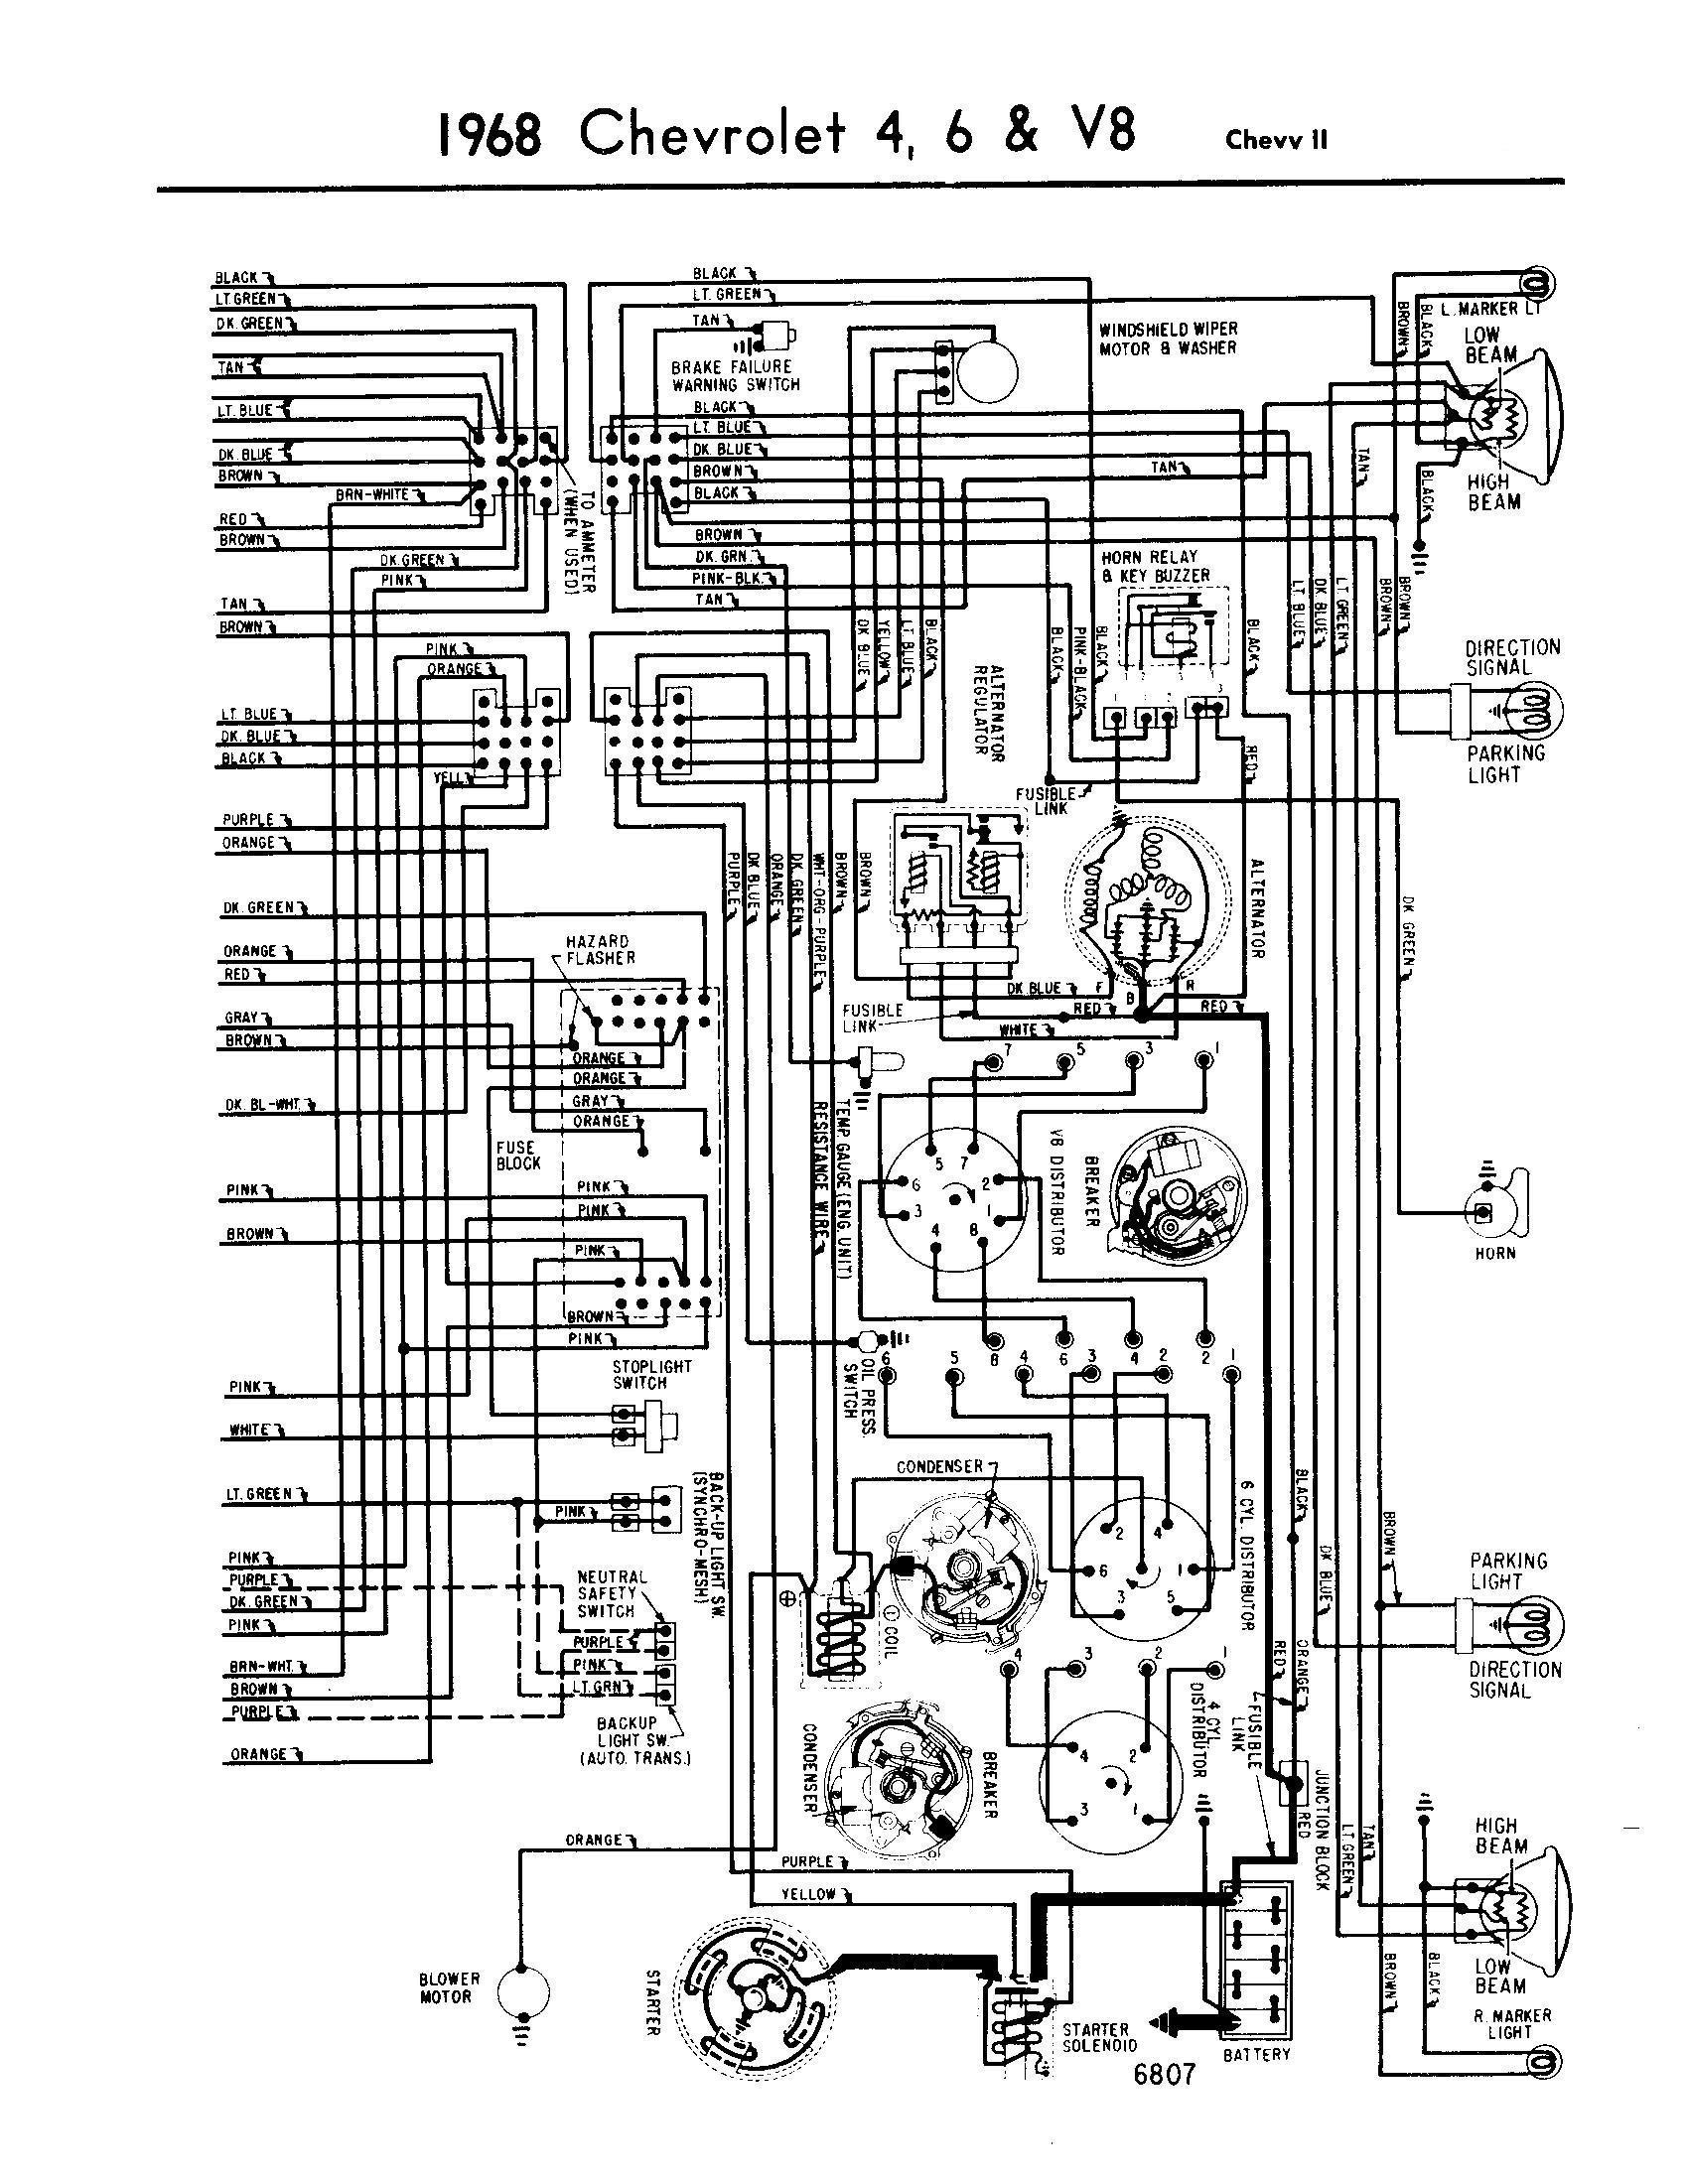 1967 Camaro Alternator Wiring Harness Free Download Electrical